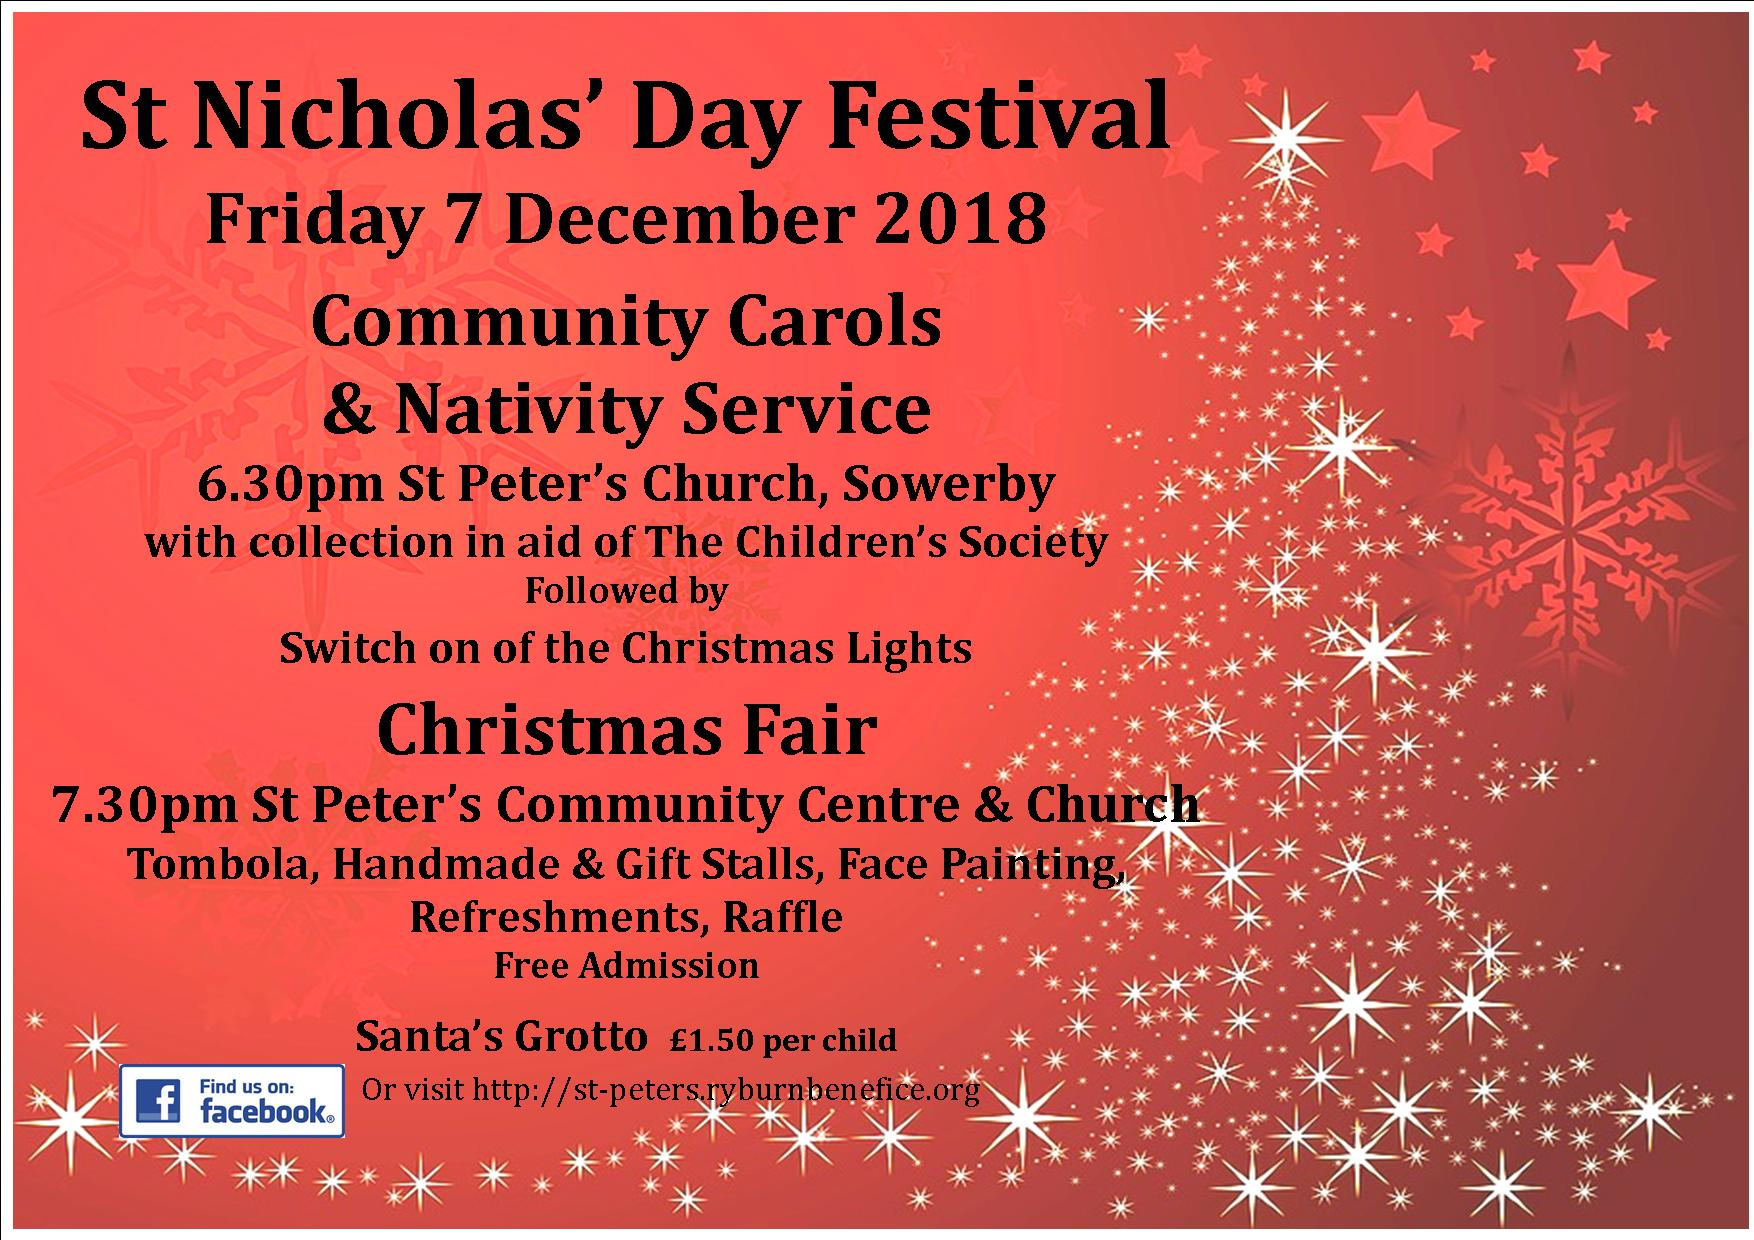 St Nicholas Day poster 2018